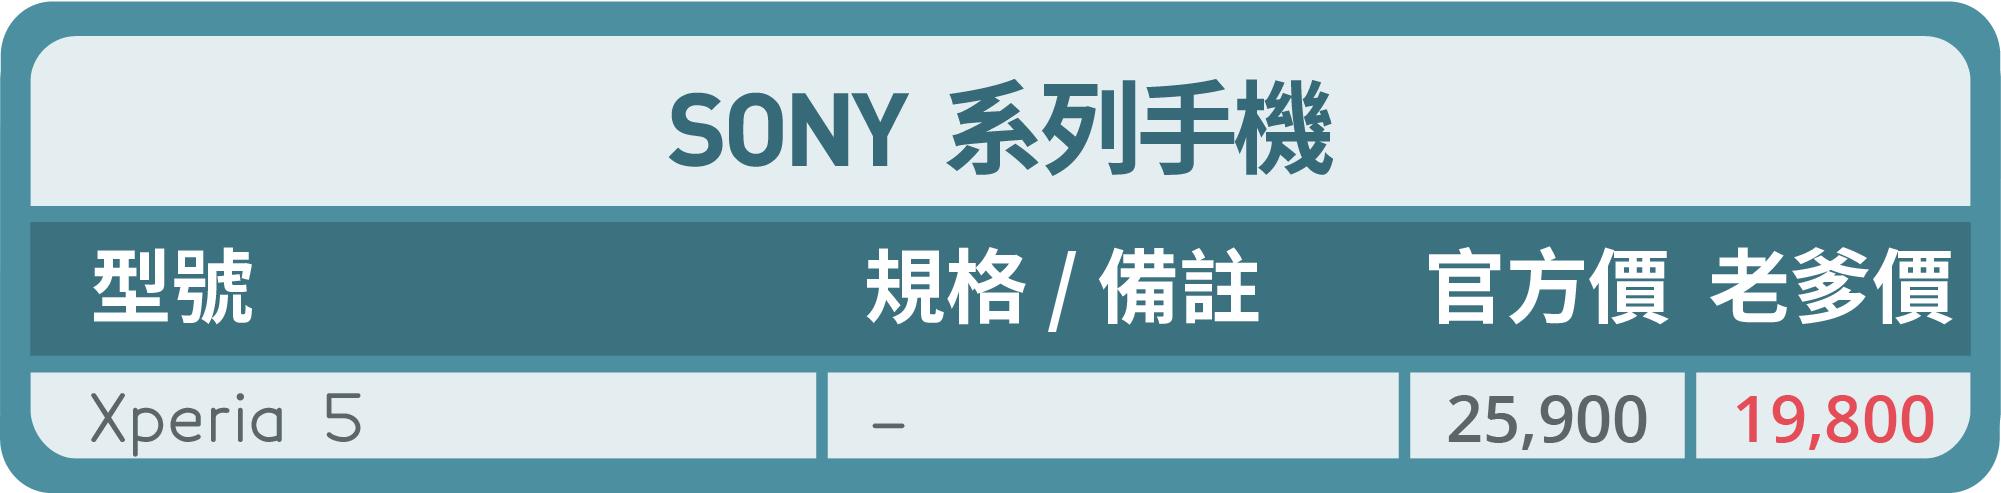 sony xperia手機優惠-台中買手機